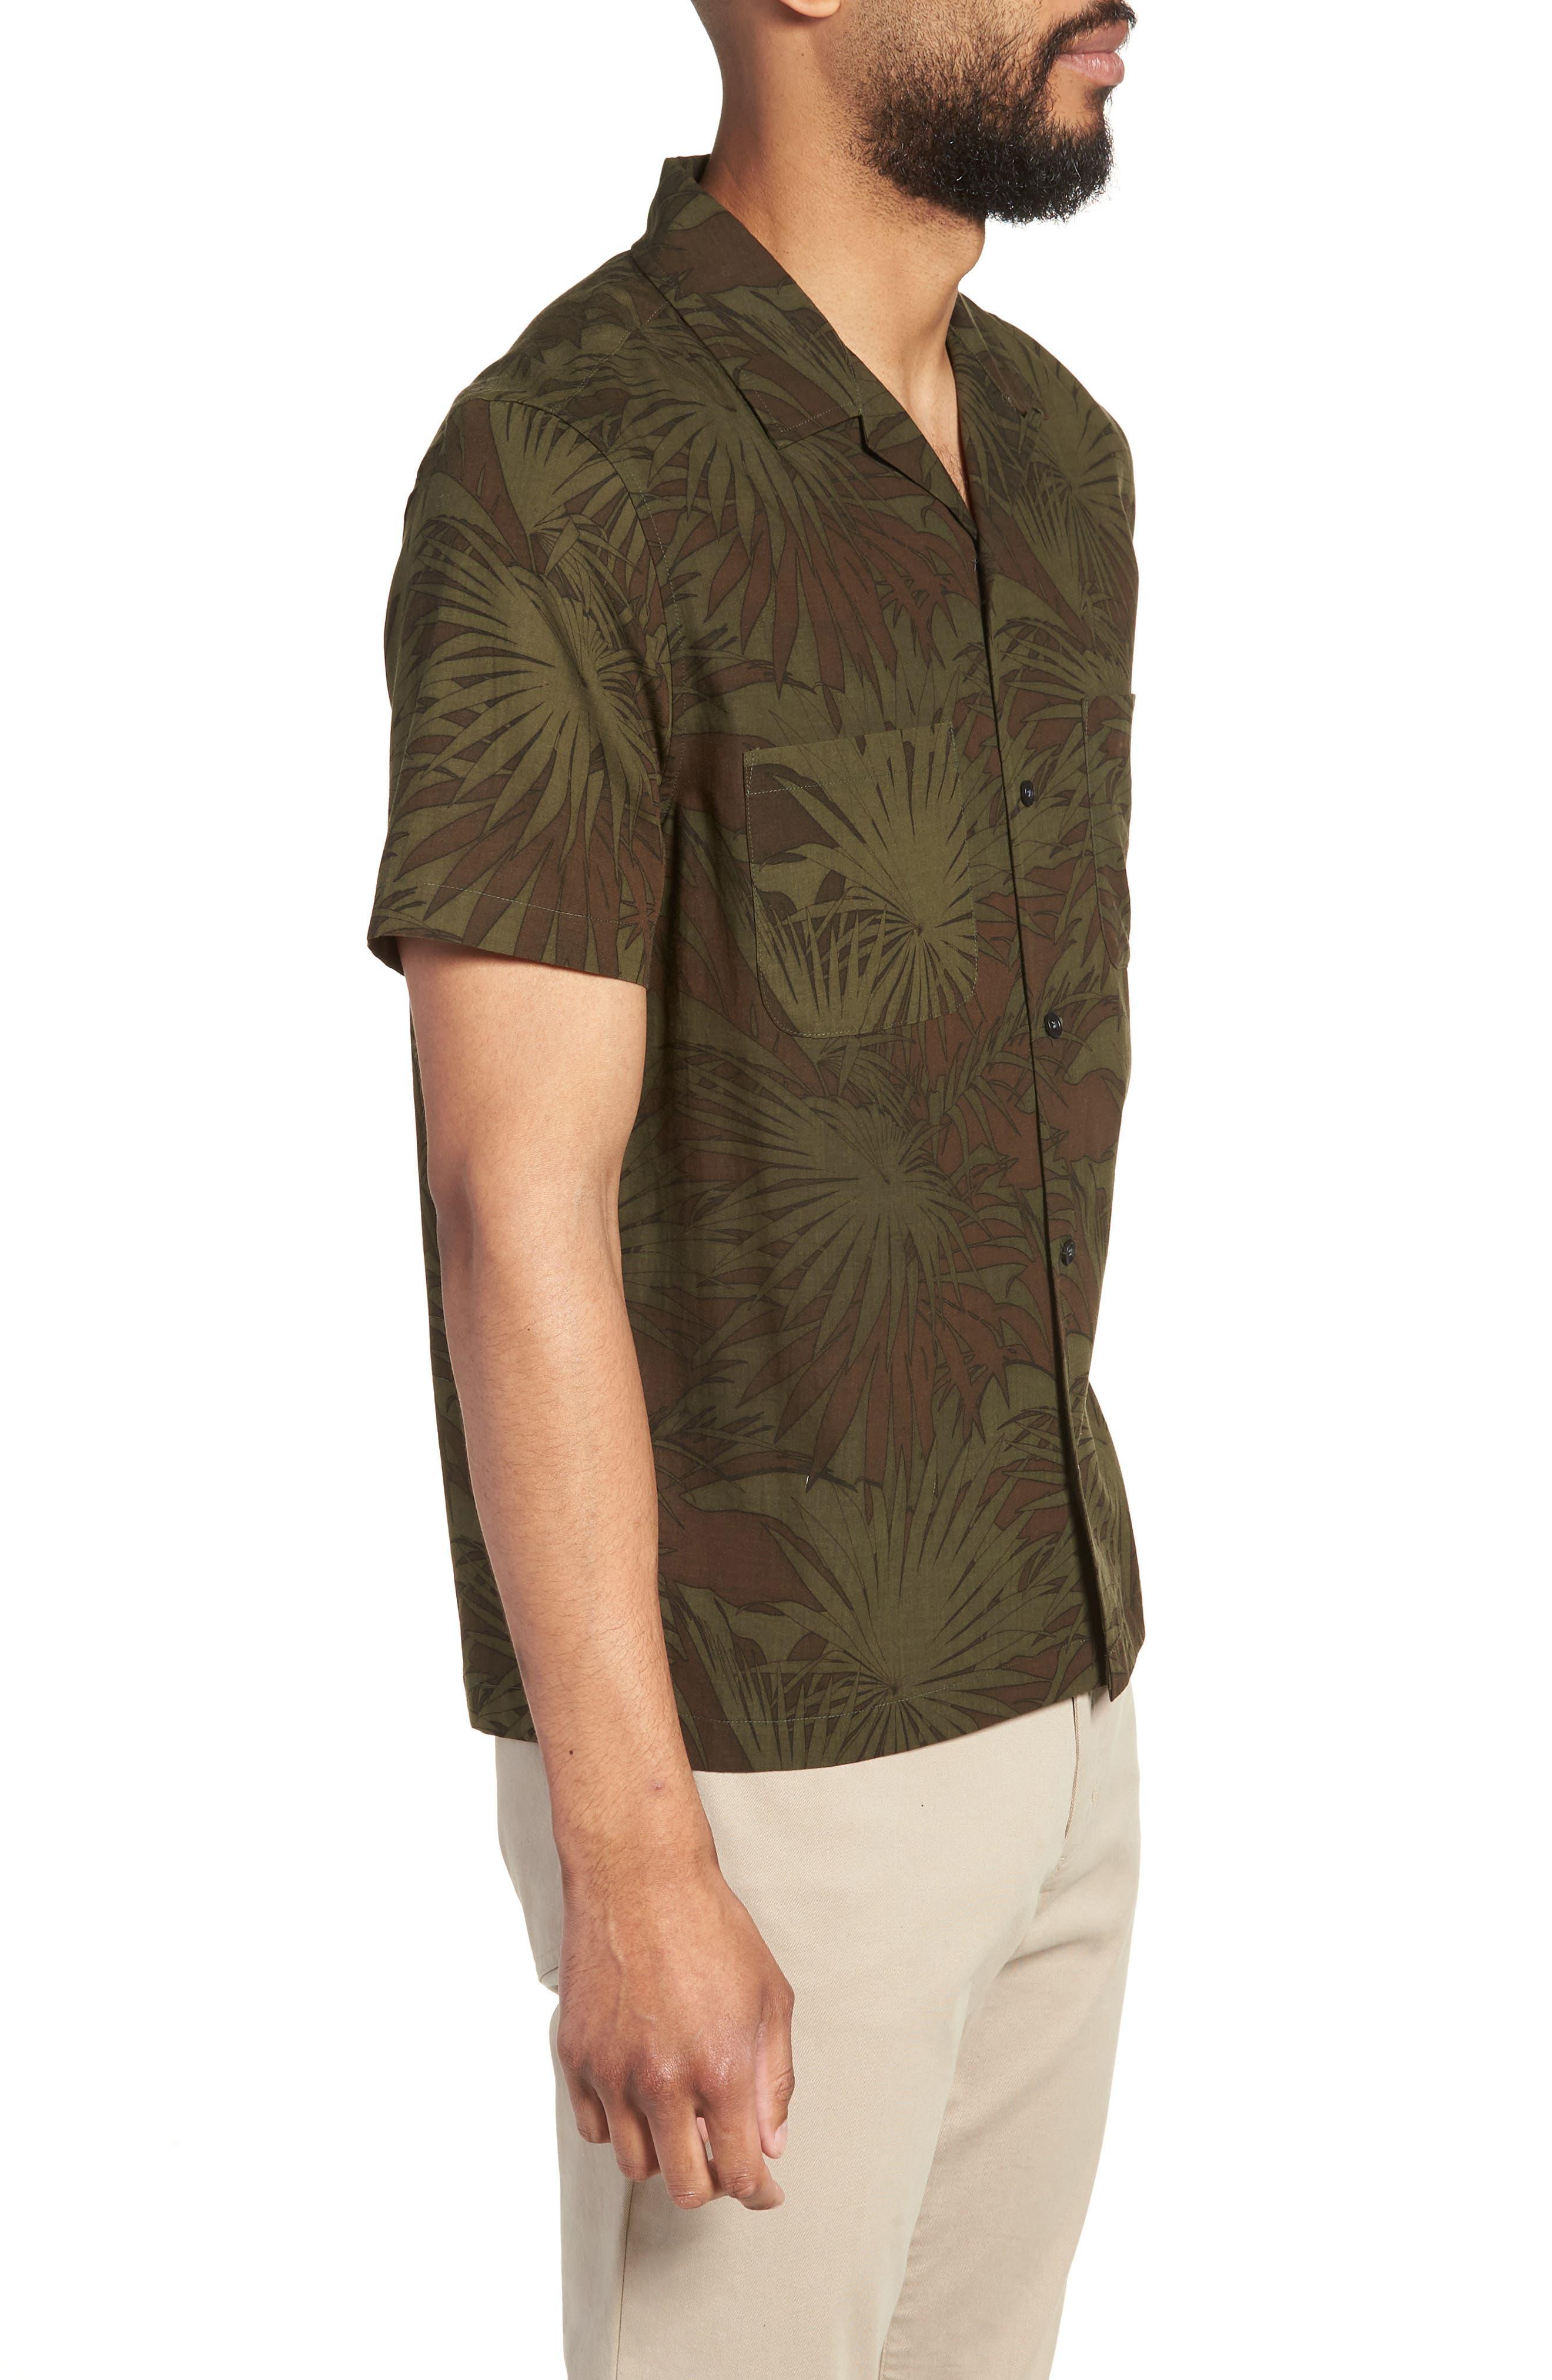 Palm Leaf Cabana Woven Shirt,                             Alternate thumbnail 3, color,                             FOLIAGE/ DRIED HERB